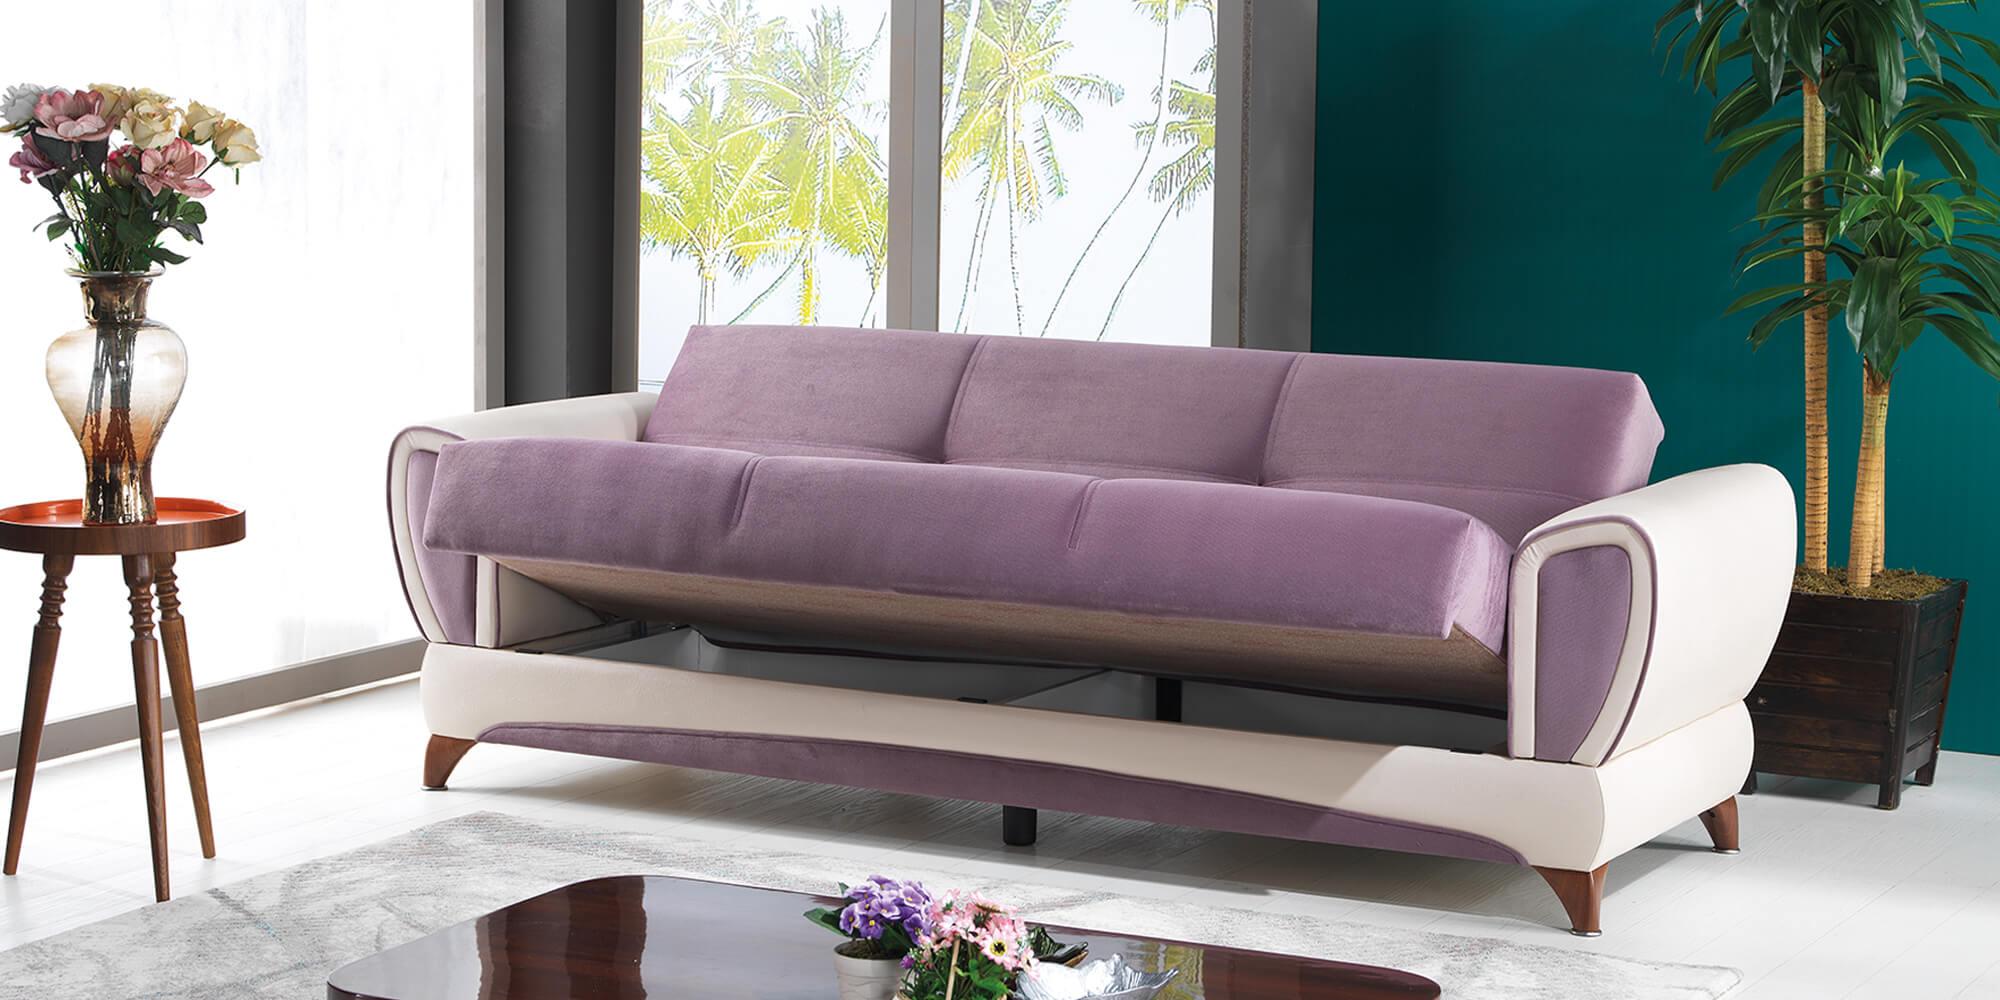 izora 3 2 1 maxi sofa set yuvam m belhaus in wuppertal cilek offizieller h ndler in europa. Black Bedroom Furniture Sets. Home Design Ideas